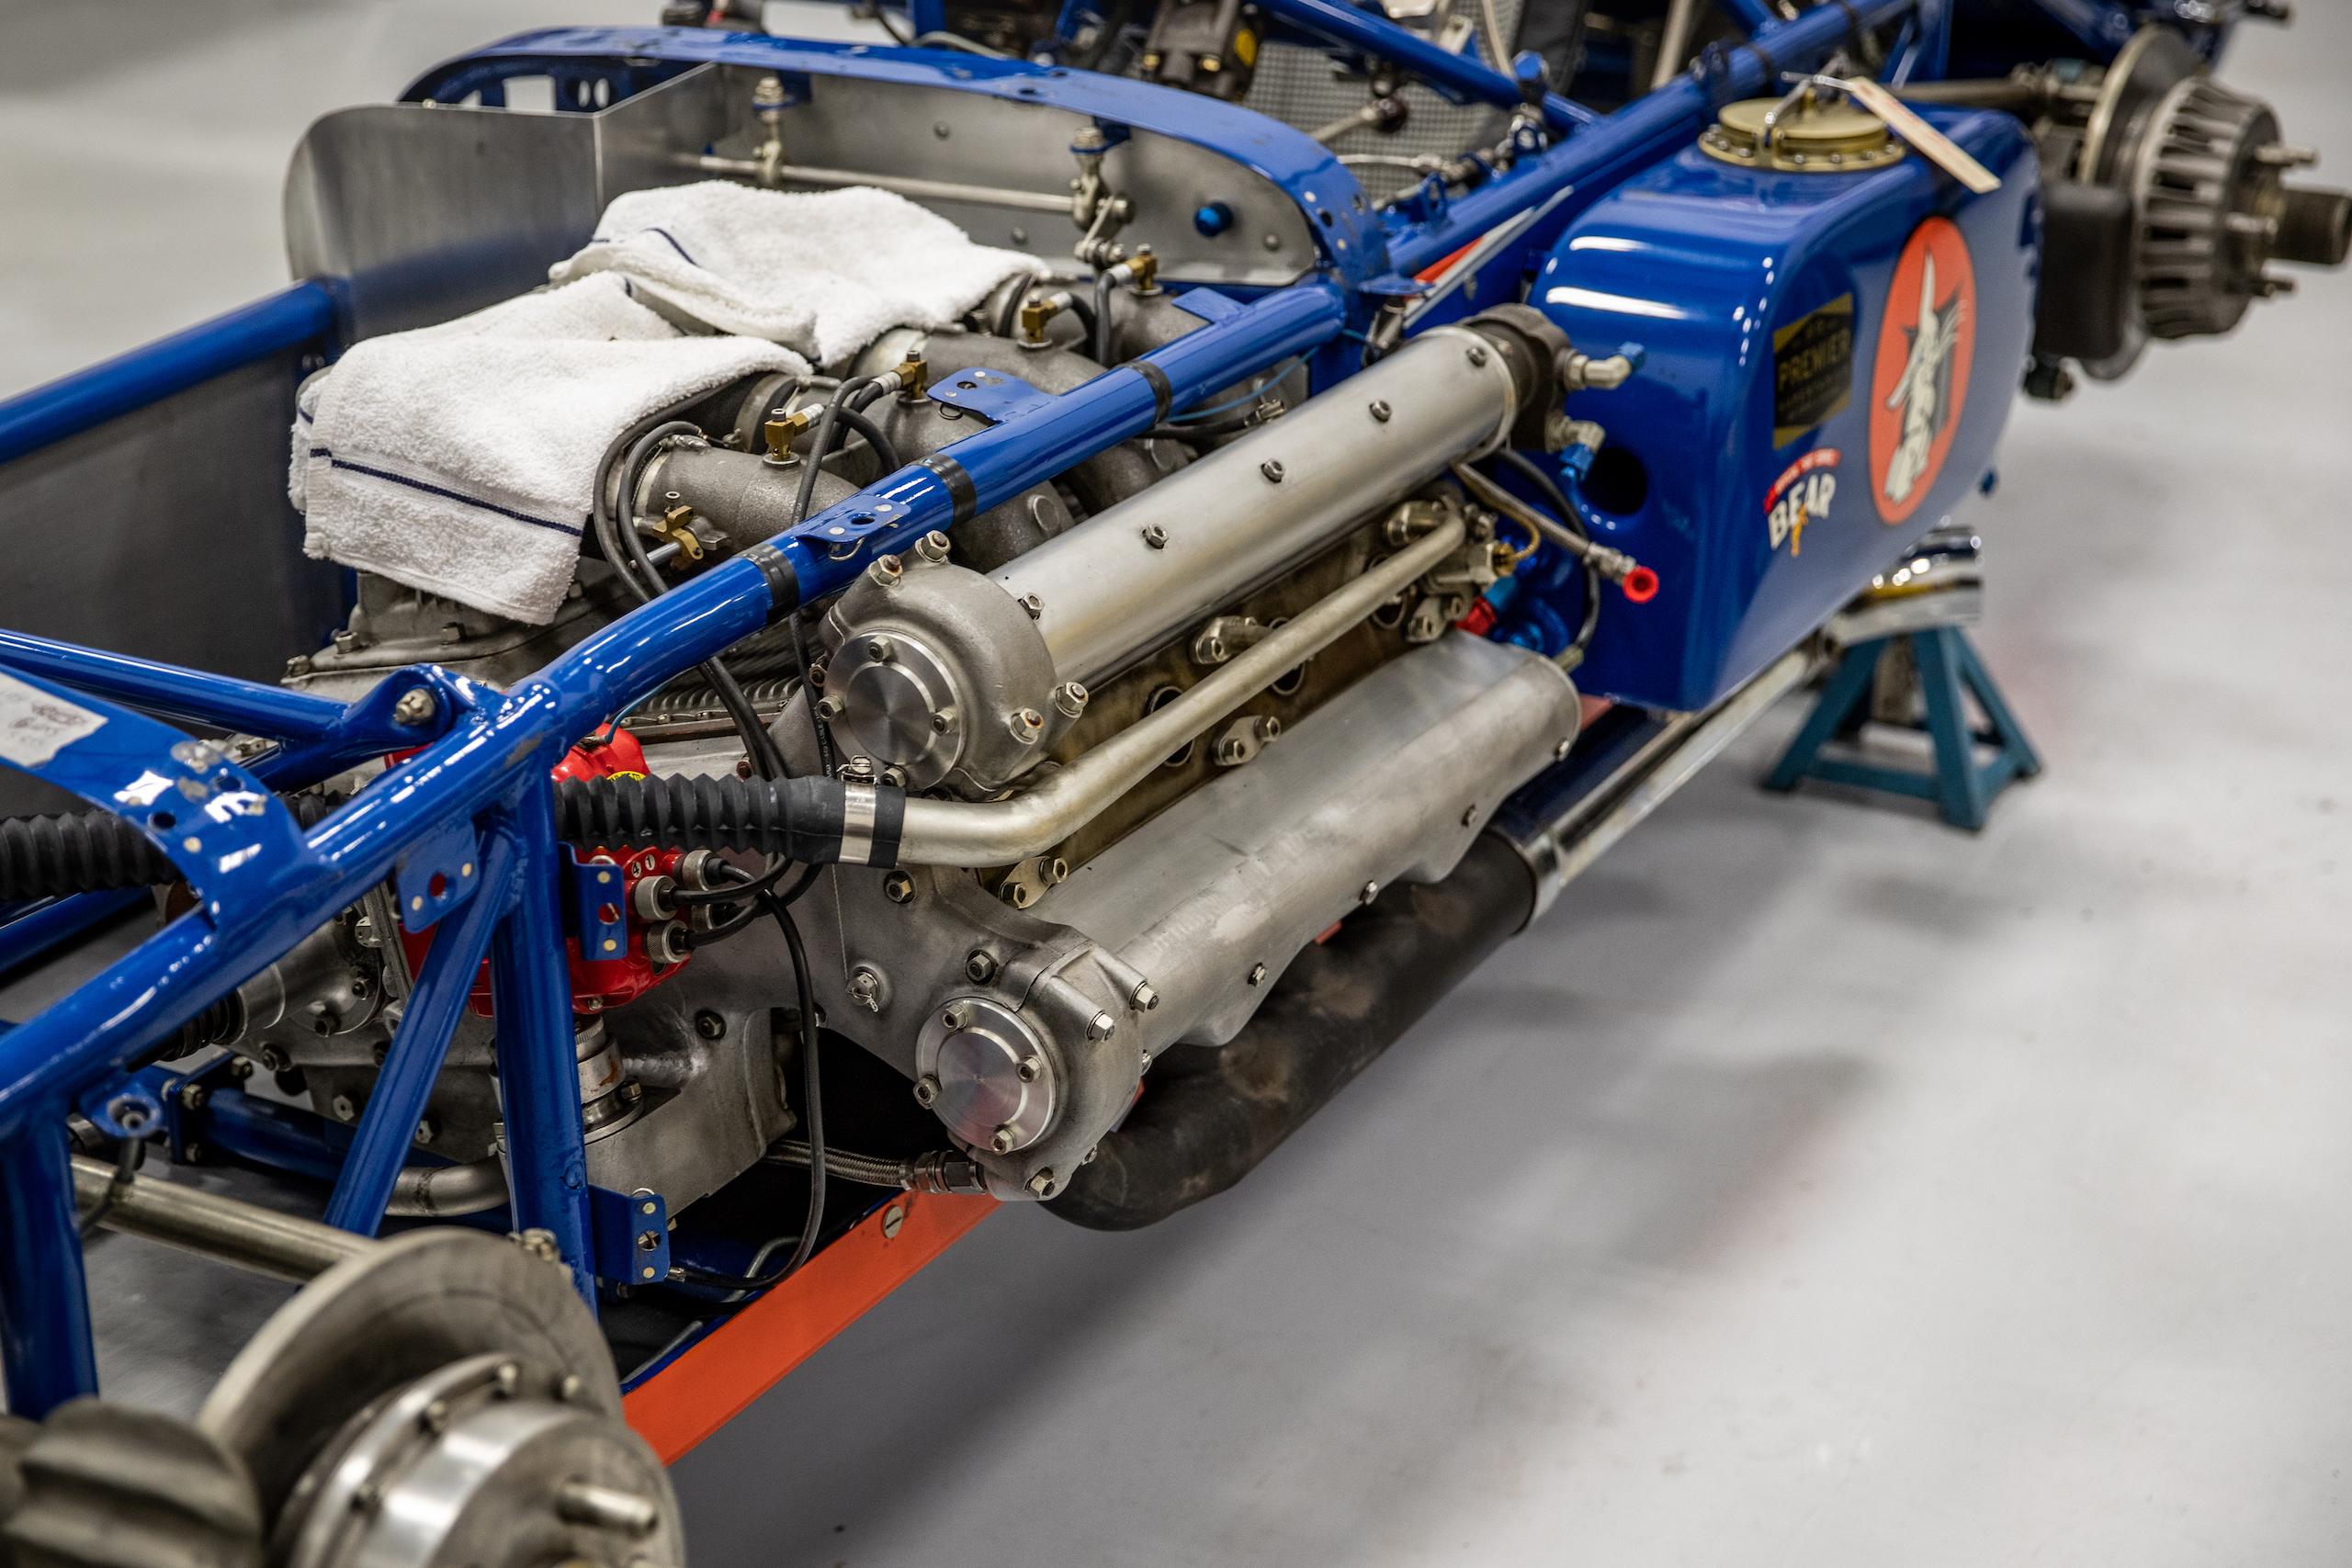 Turn 4 Restorations racer